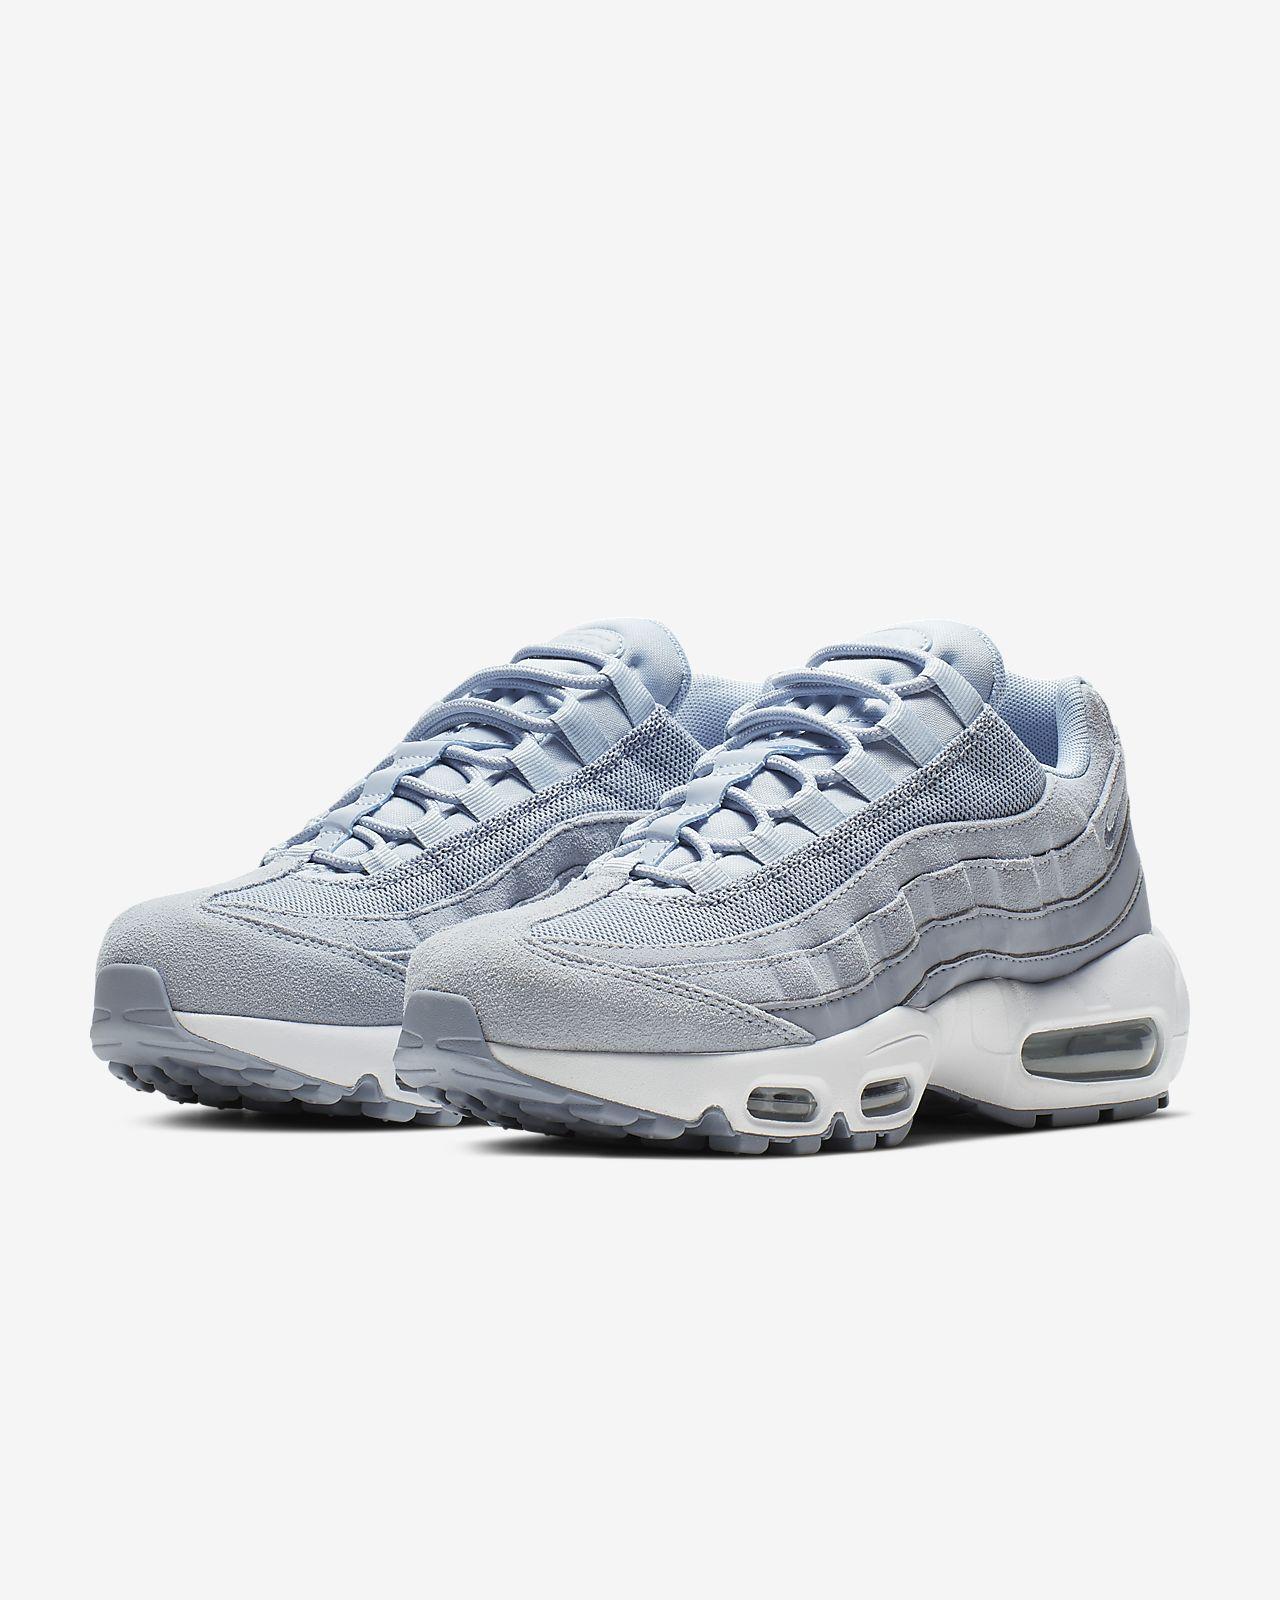 ce5ac6cf00 Nike Air Max 95 Premium Women's Shoe